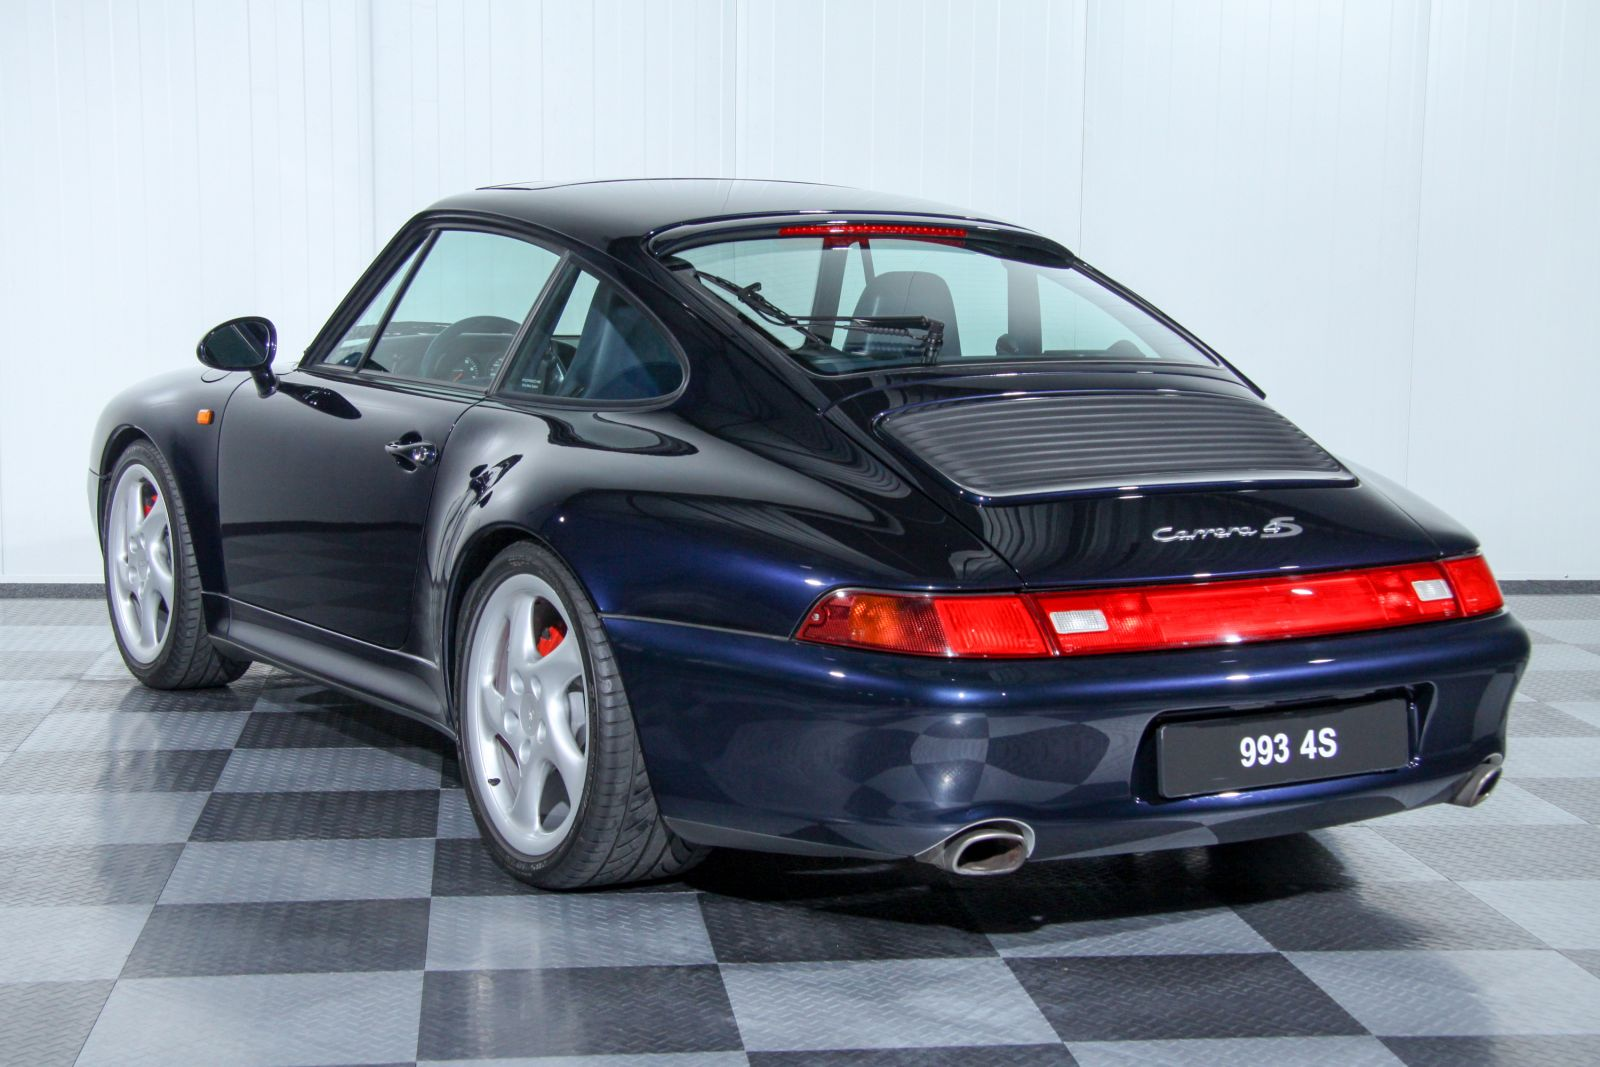 dream garage collectionporsche porsche 911 993 carrera 4s coupe. Black Bedroom Furniture Sets. Home Design Ideas